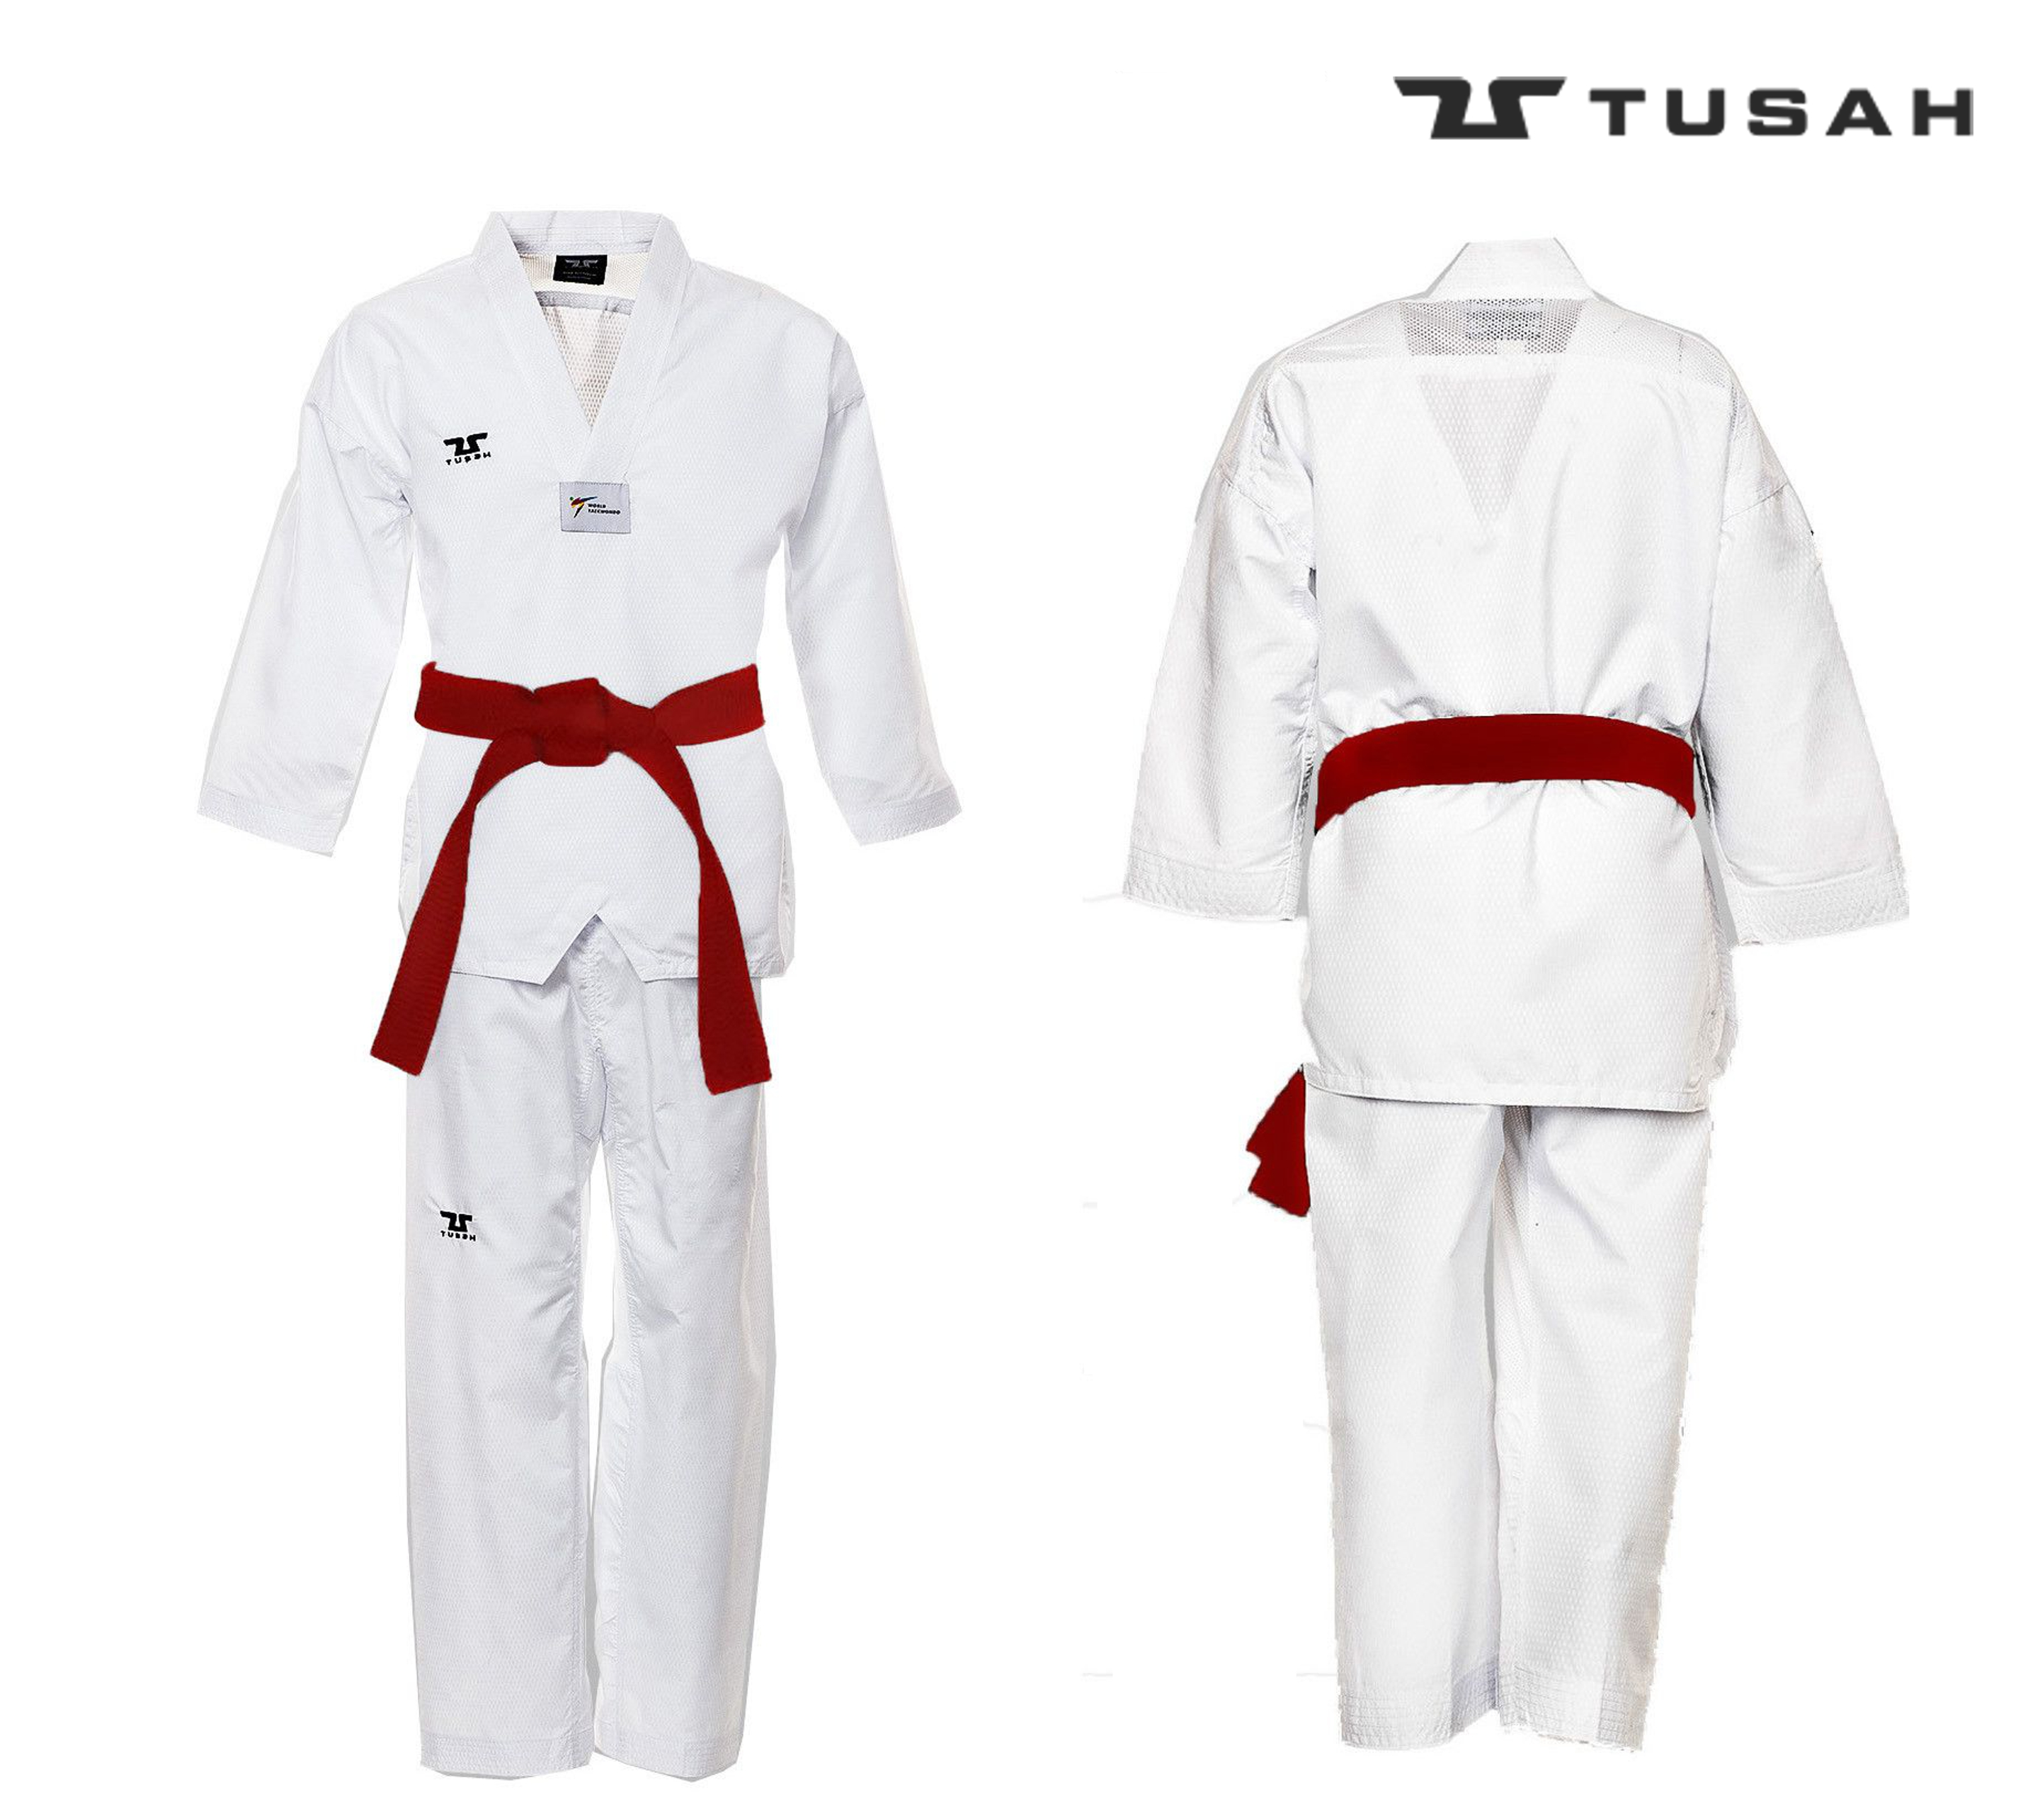 Childrens World Taekwondo White Collar Fighter UniformChildrens World Taekwondo White Collar Fighter Uniform